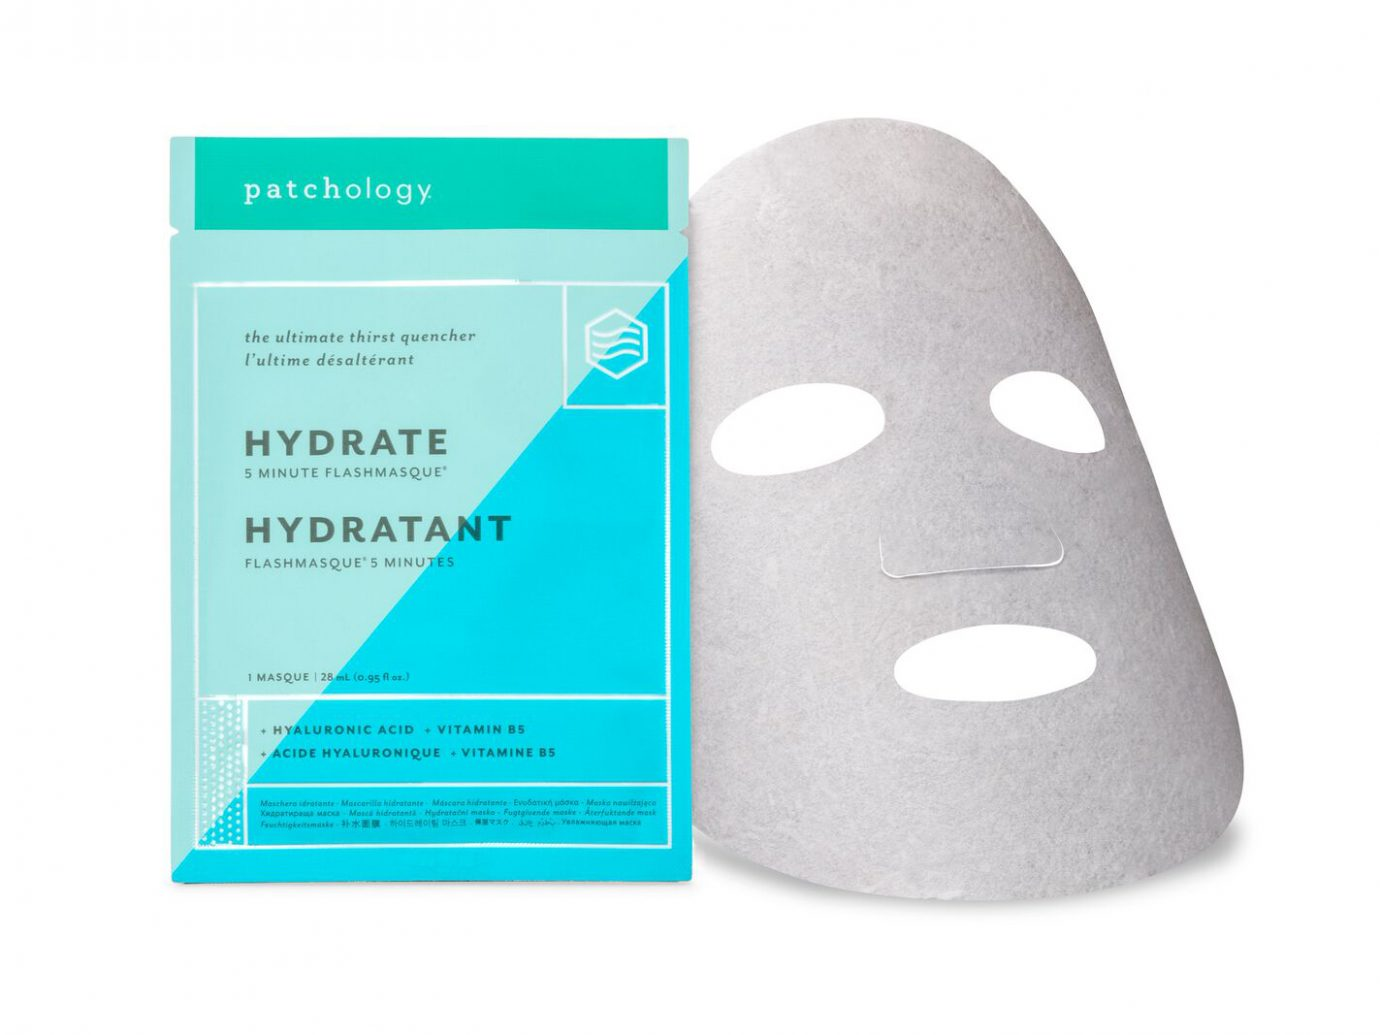 Patchology Hydrating FlashMasque